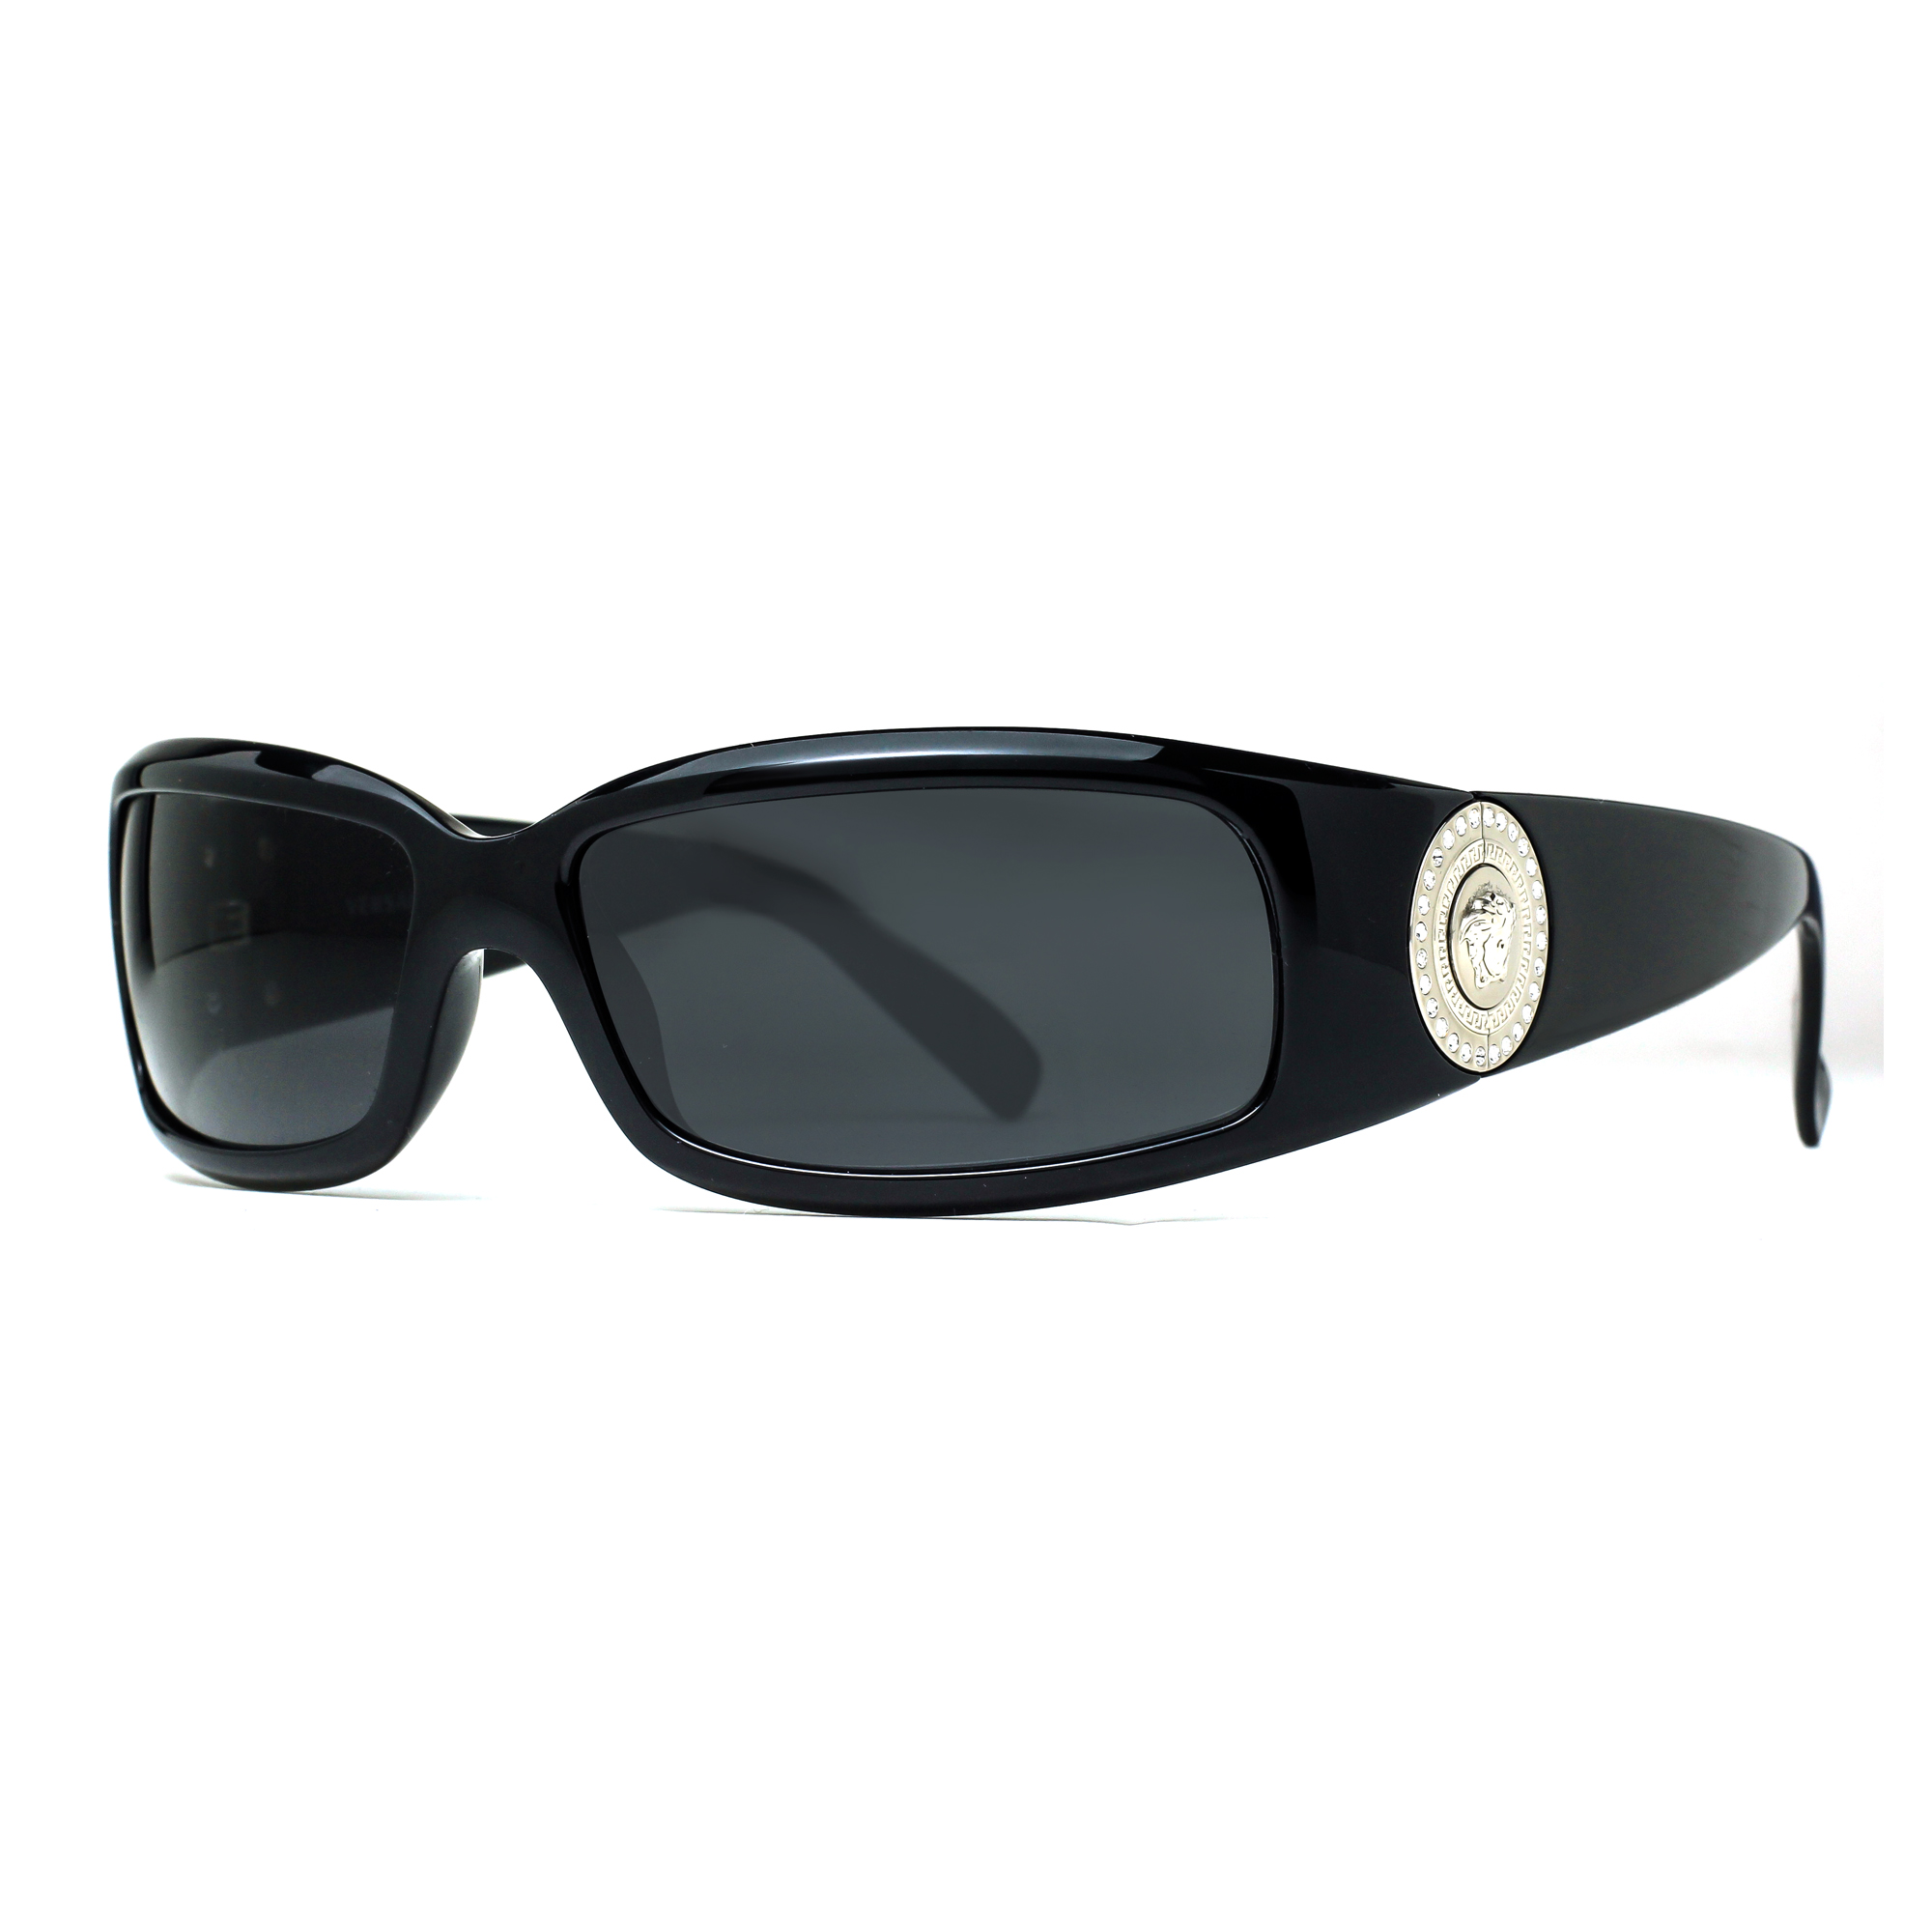 10fdb9efc394 Versace Sunglasses Ve 4044b - Bitterroot Public Library